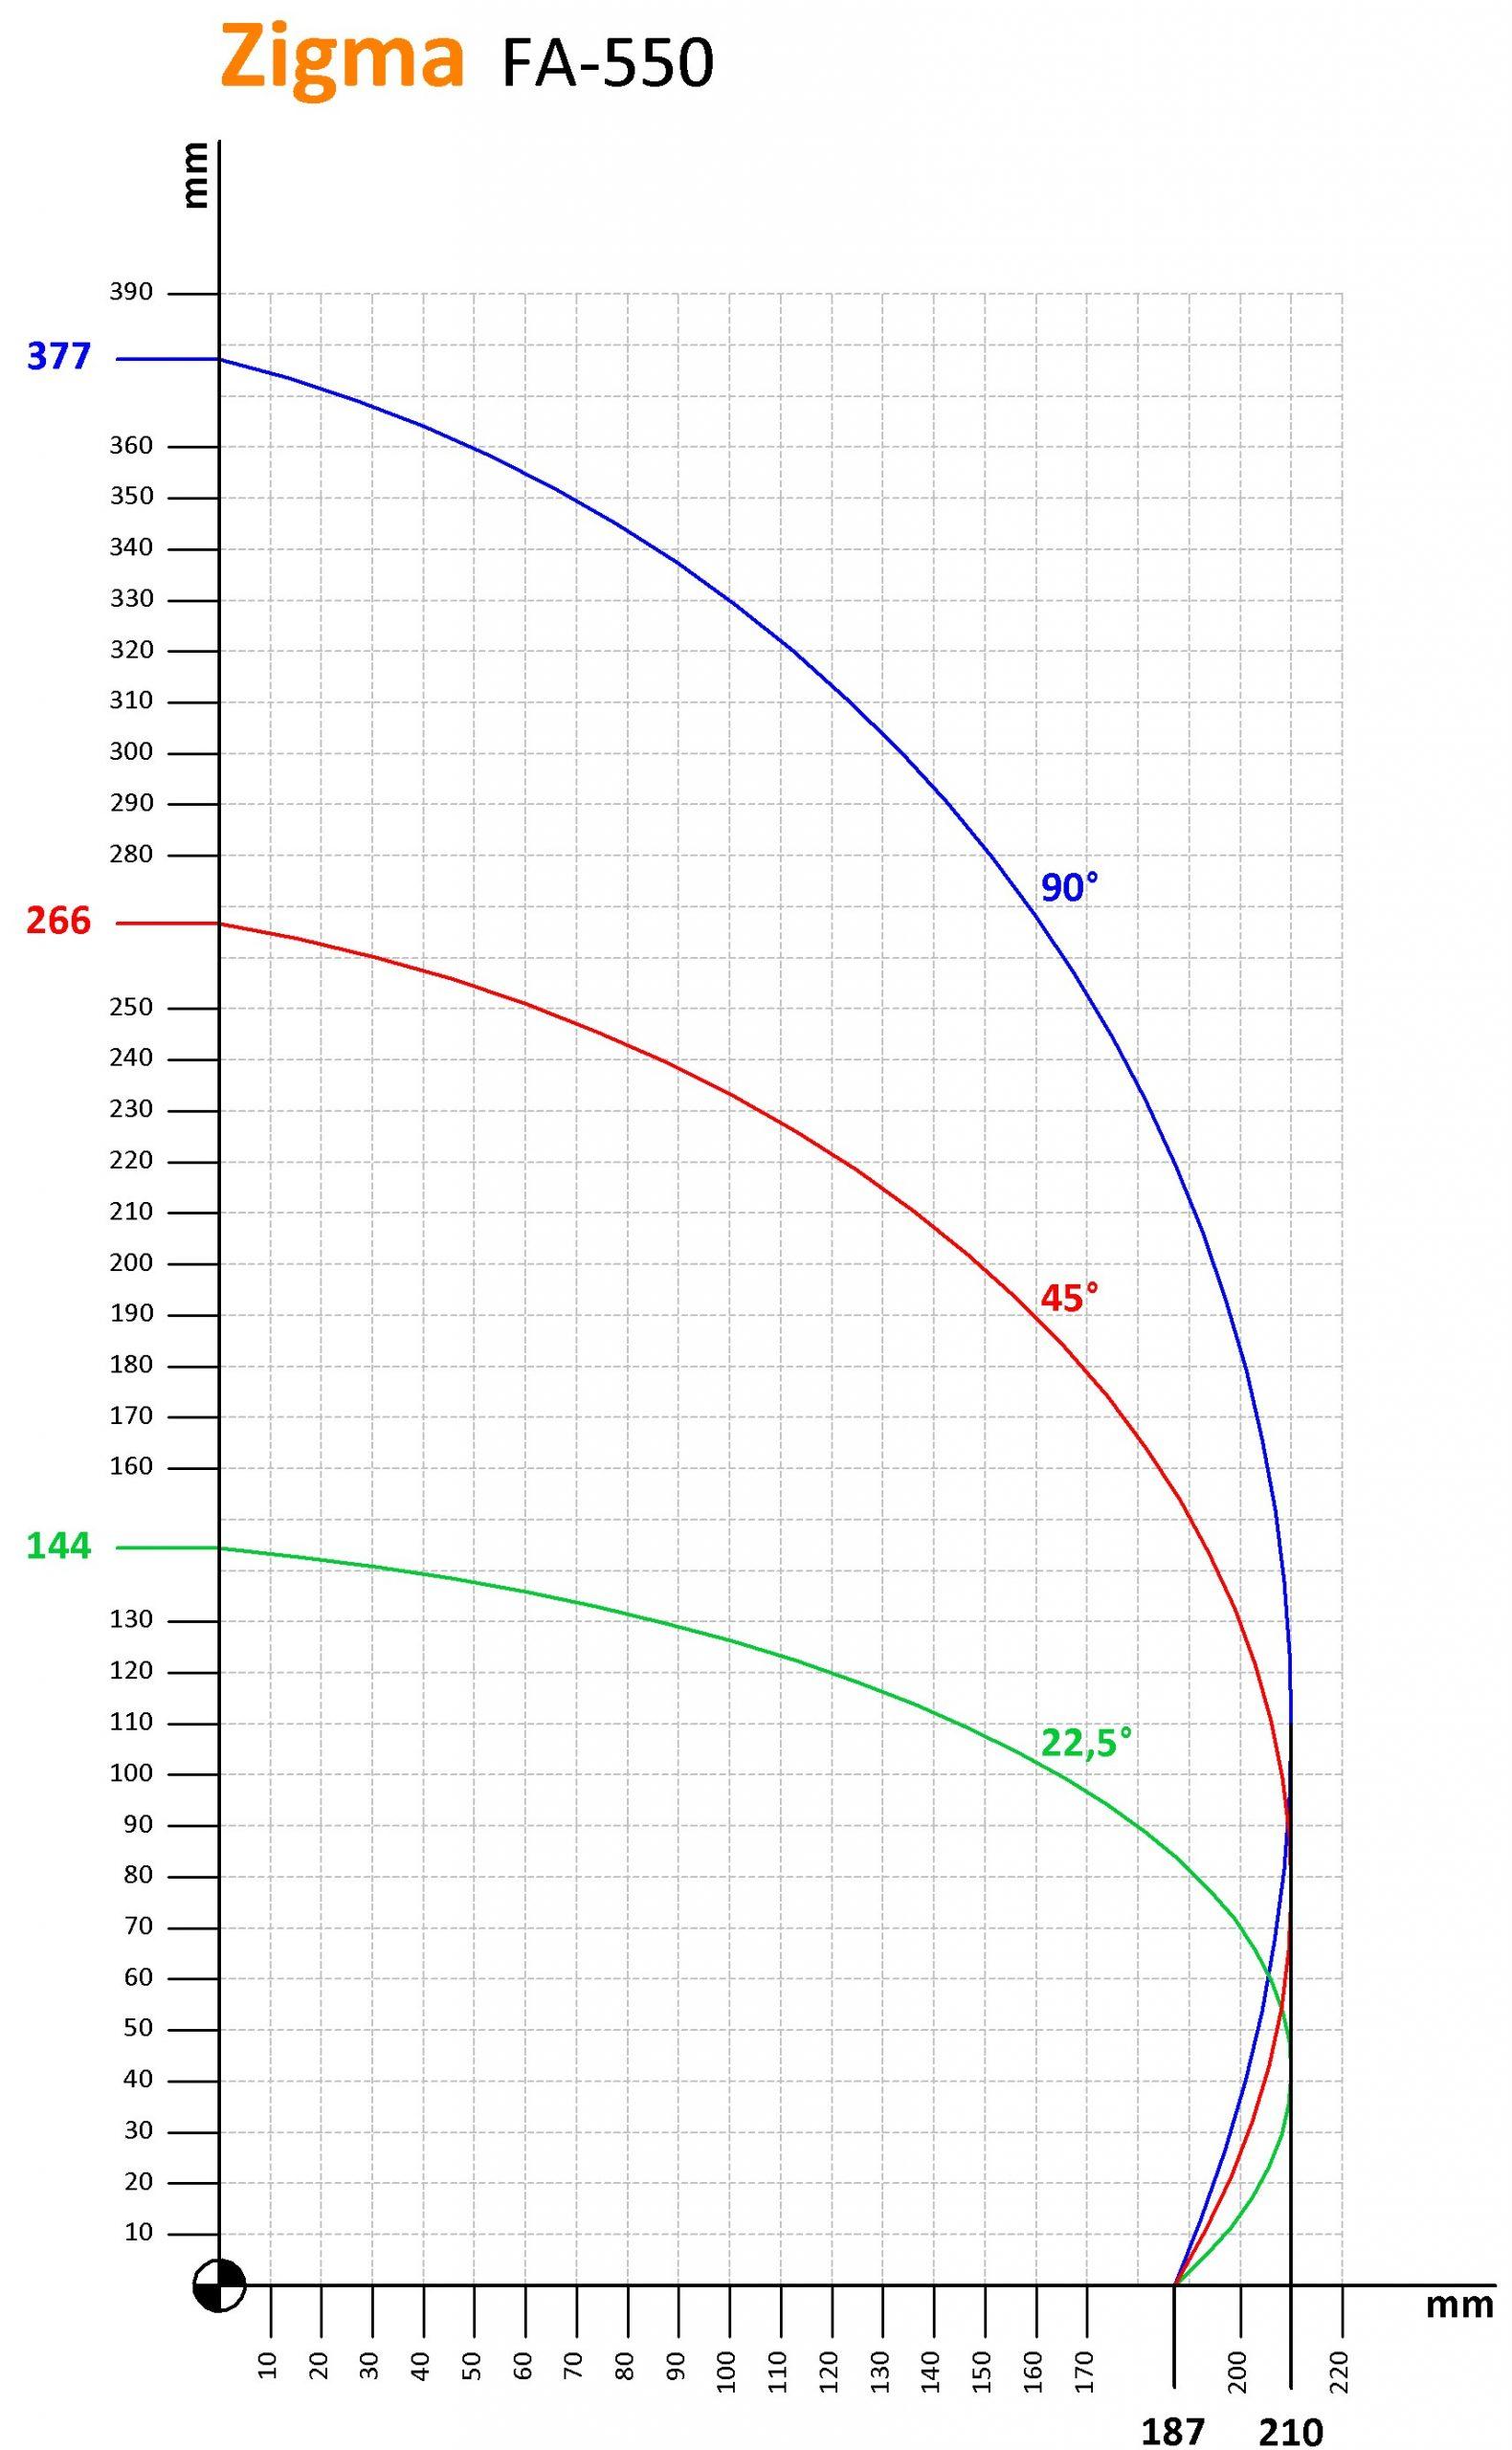 Zigma-FA550_Kesme-Kapasitesi-scaled